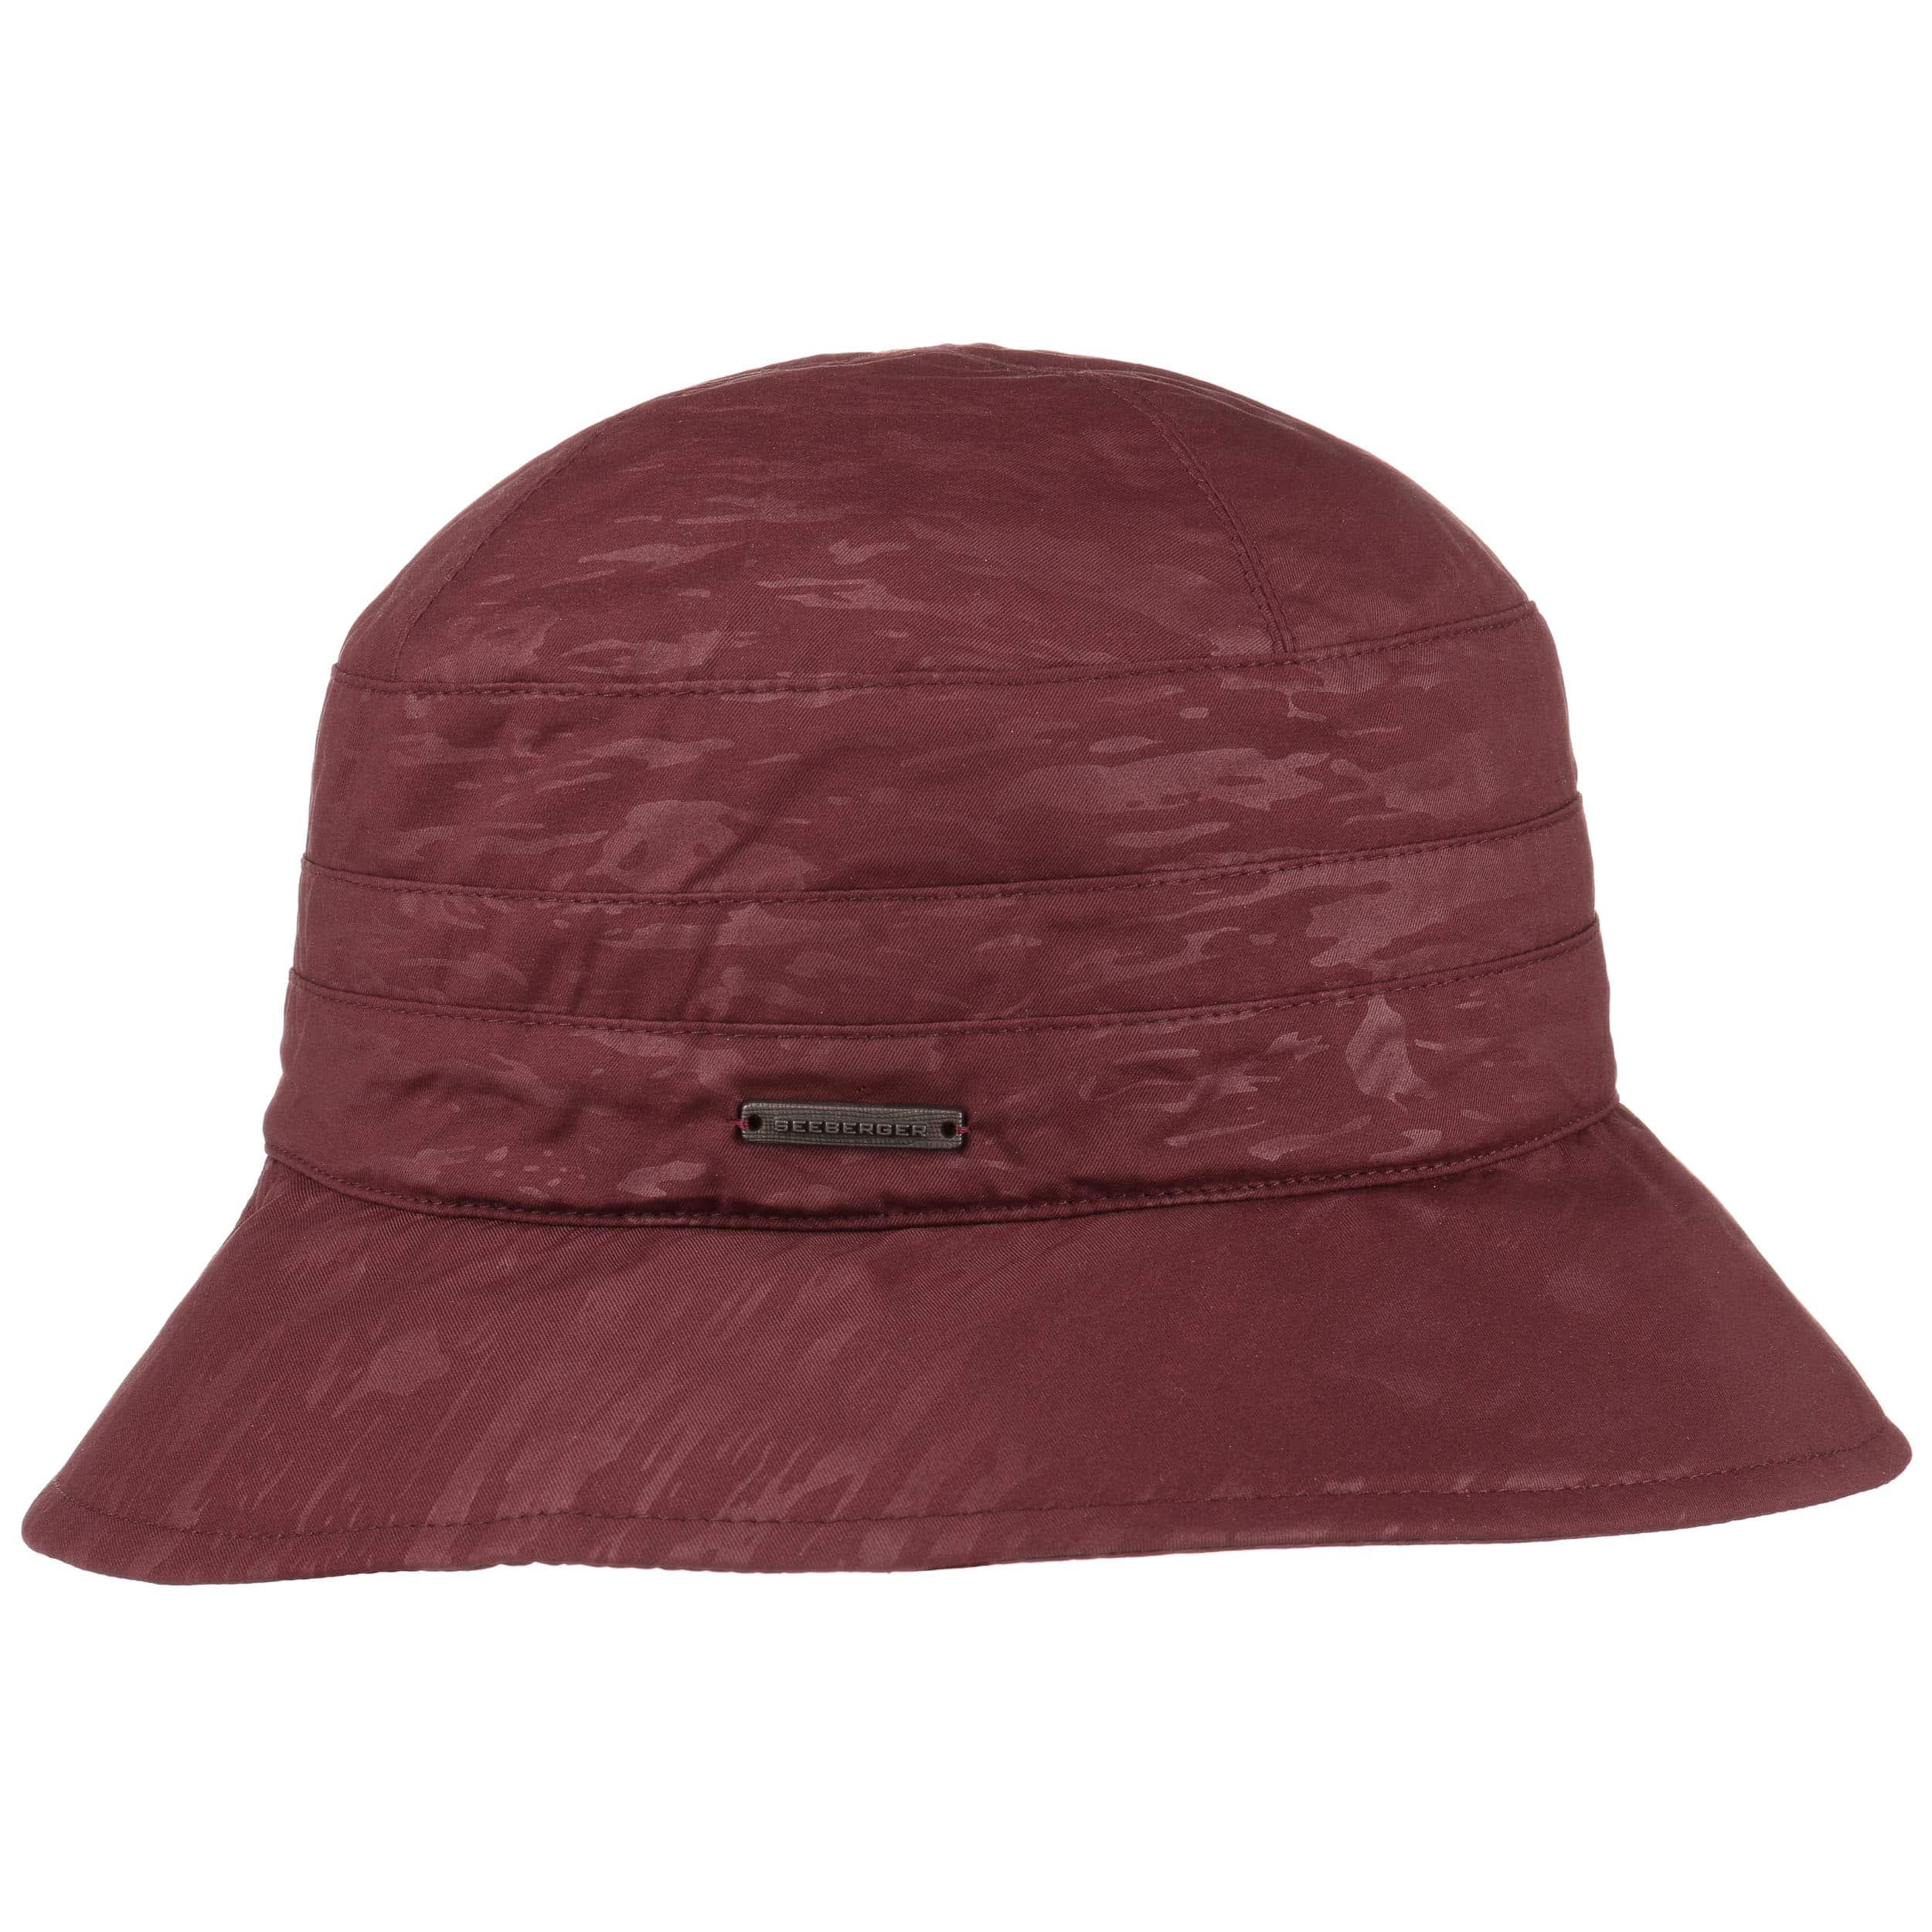 ... Bell Shaped Cloche Rain Hat by Seeberger - bordeaux 5 ... acb1307f2dd